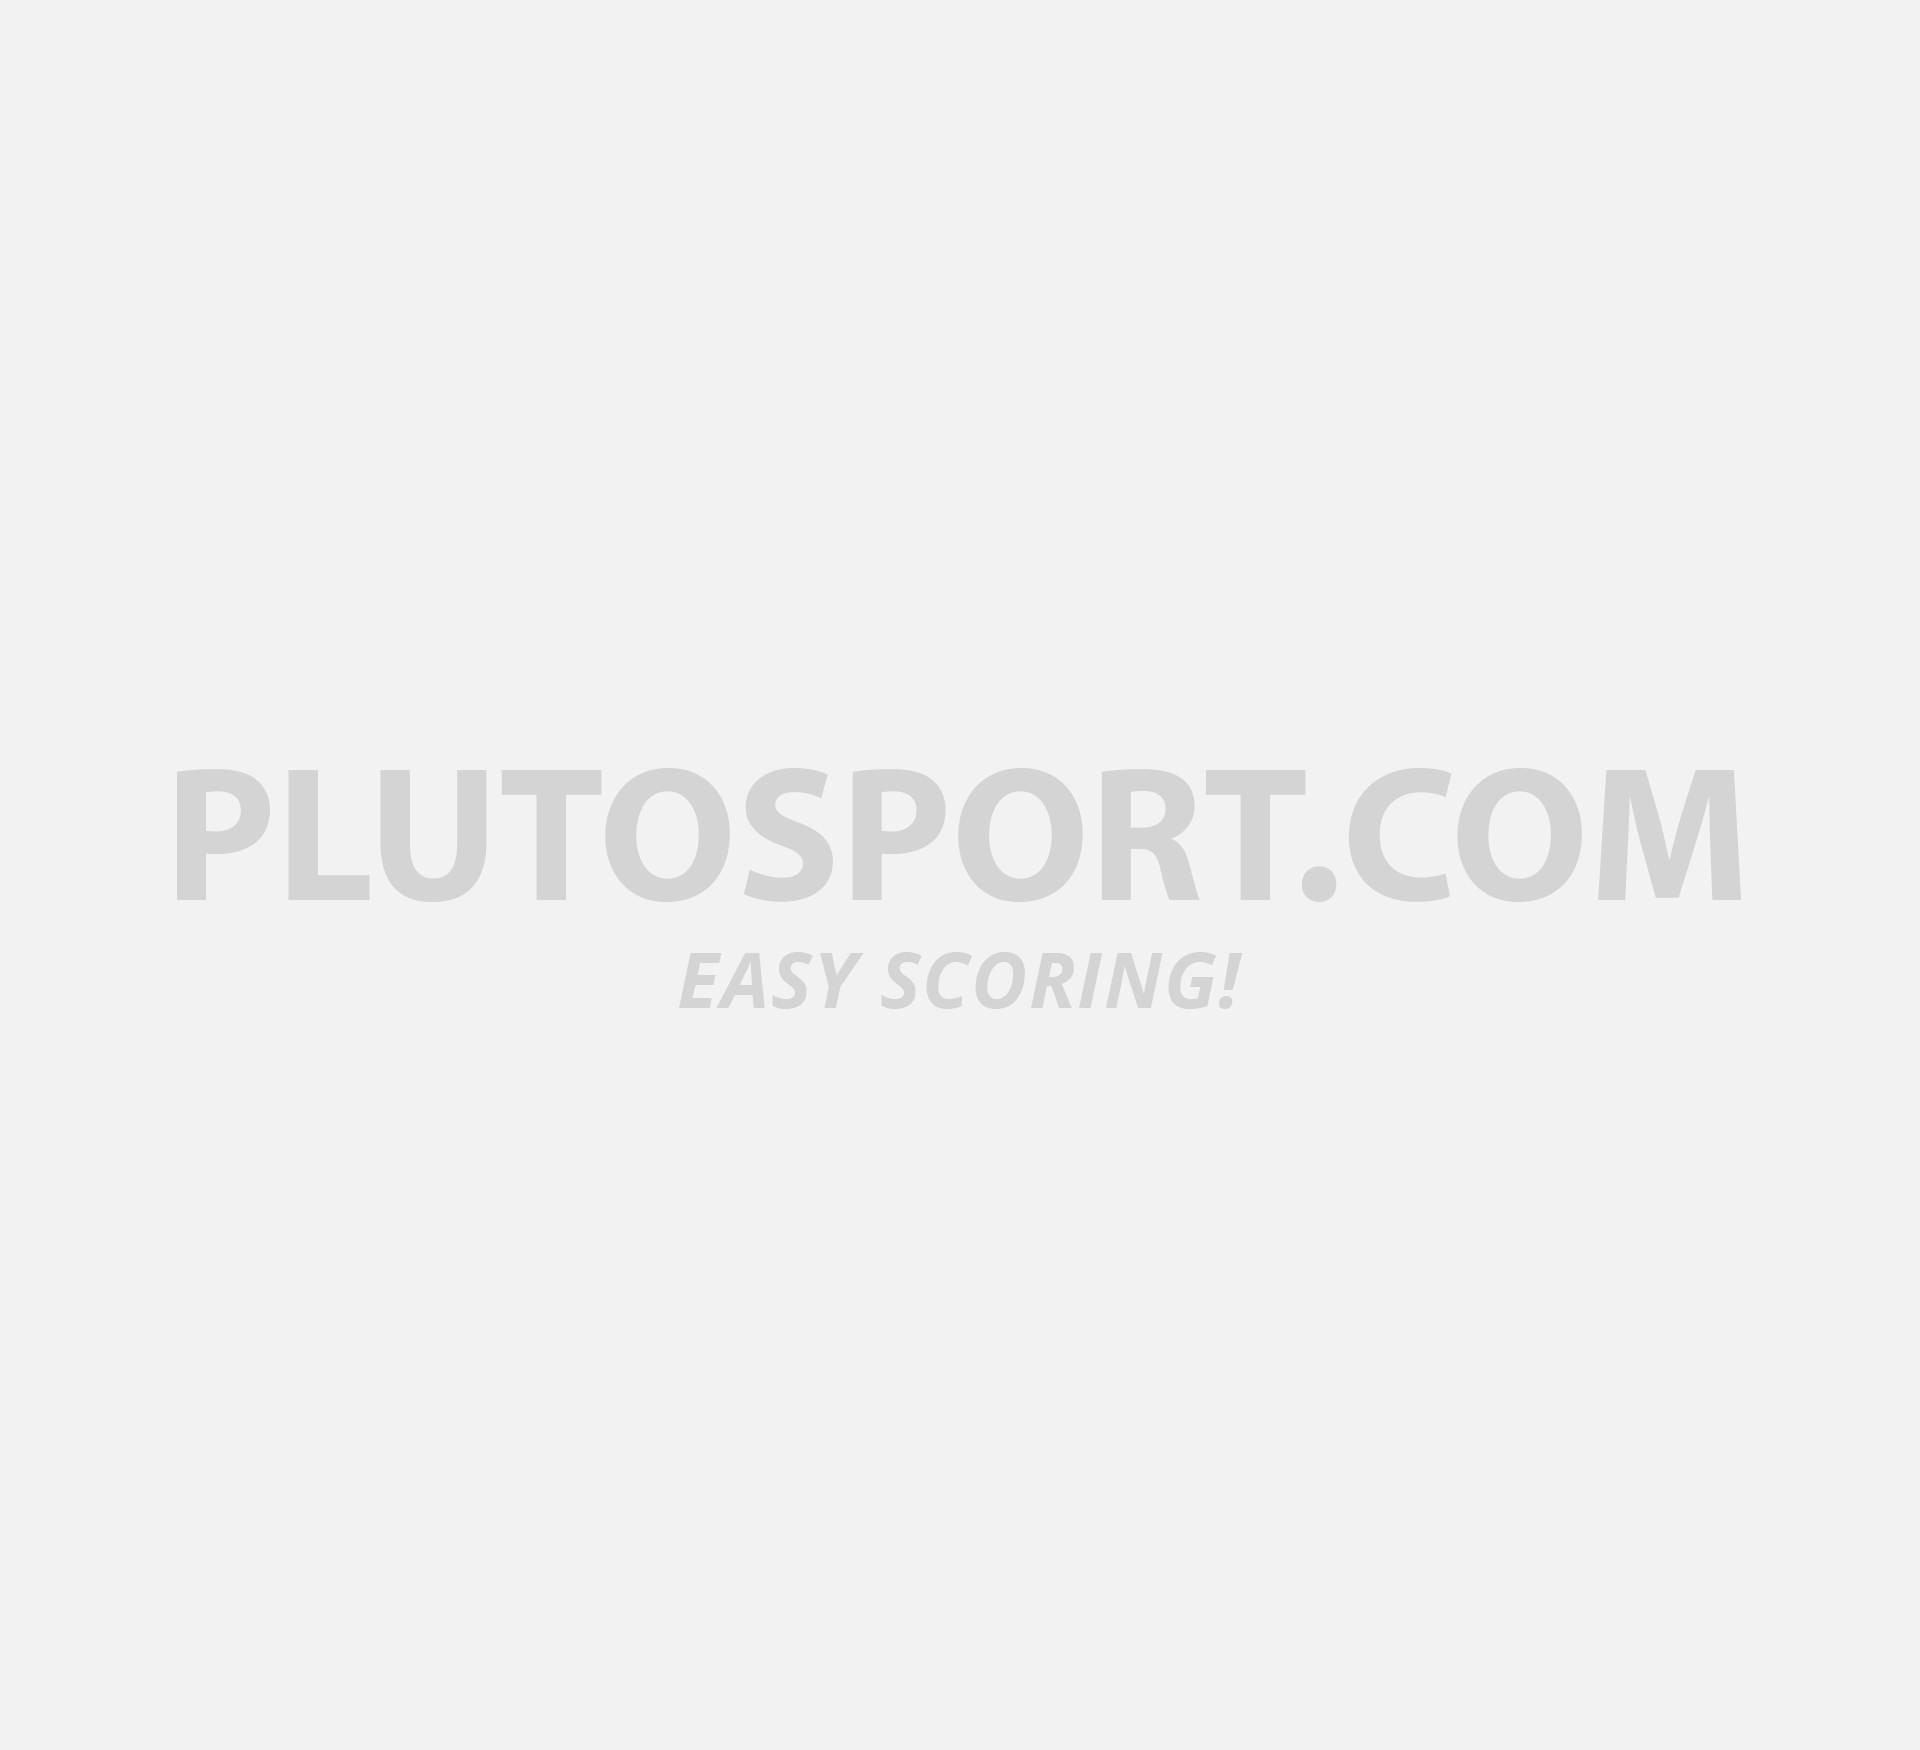 Asics Gel-Blackheath 7 Hockeyshoe Men